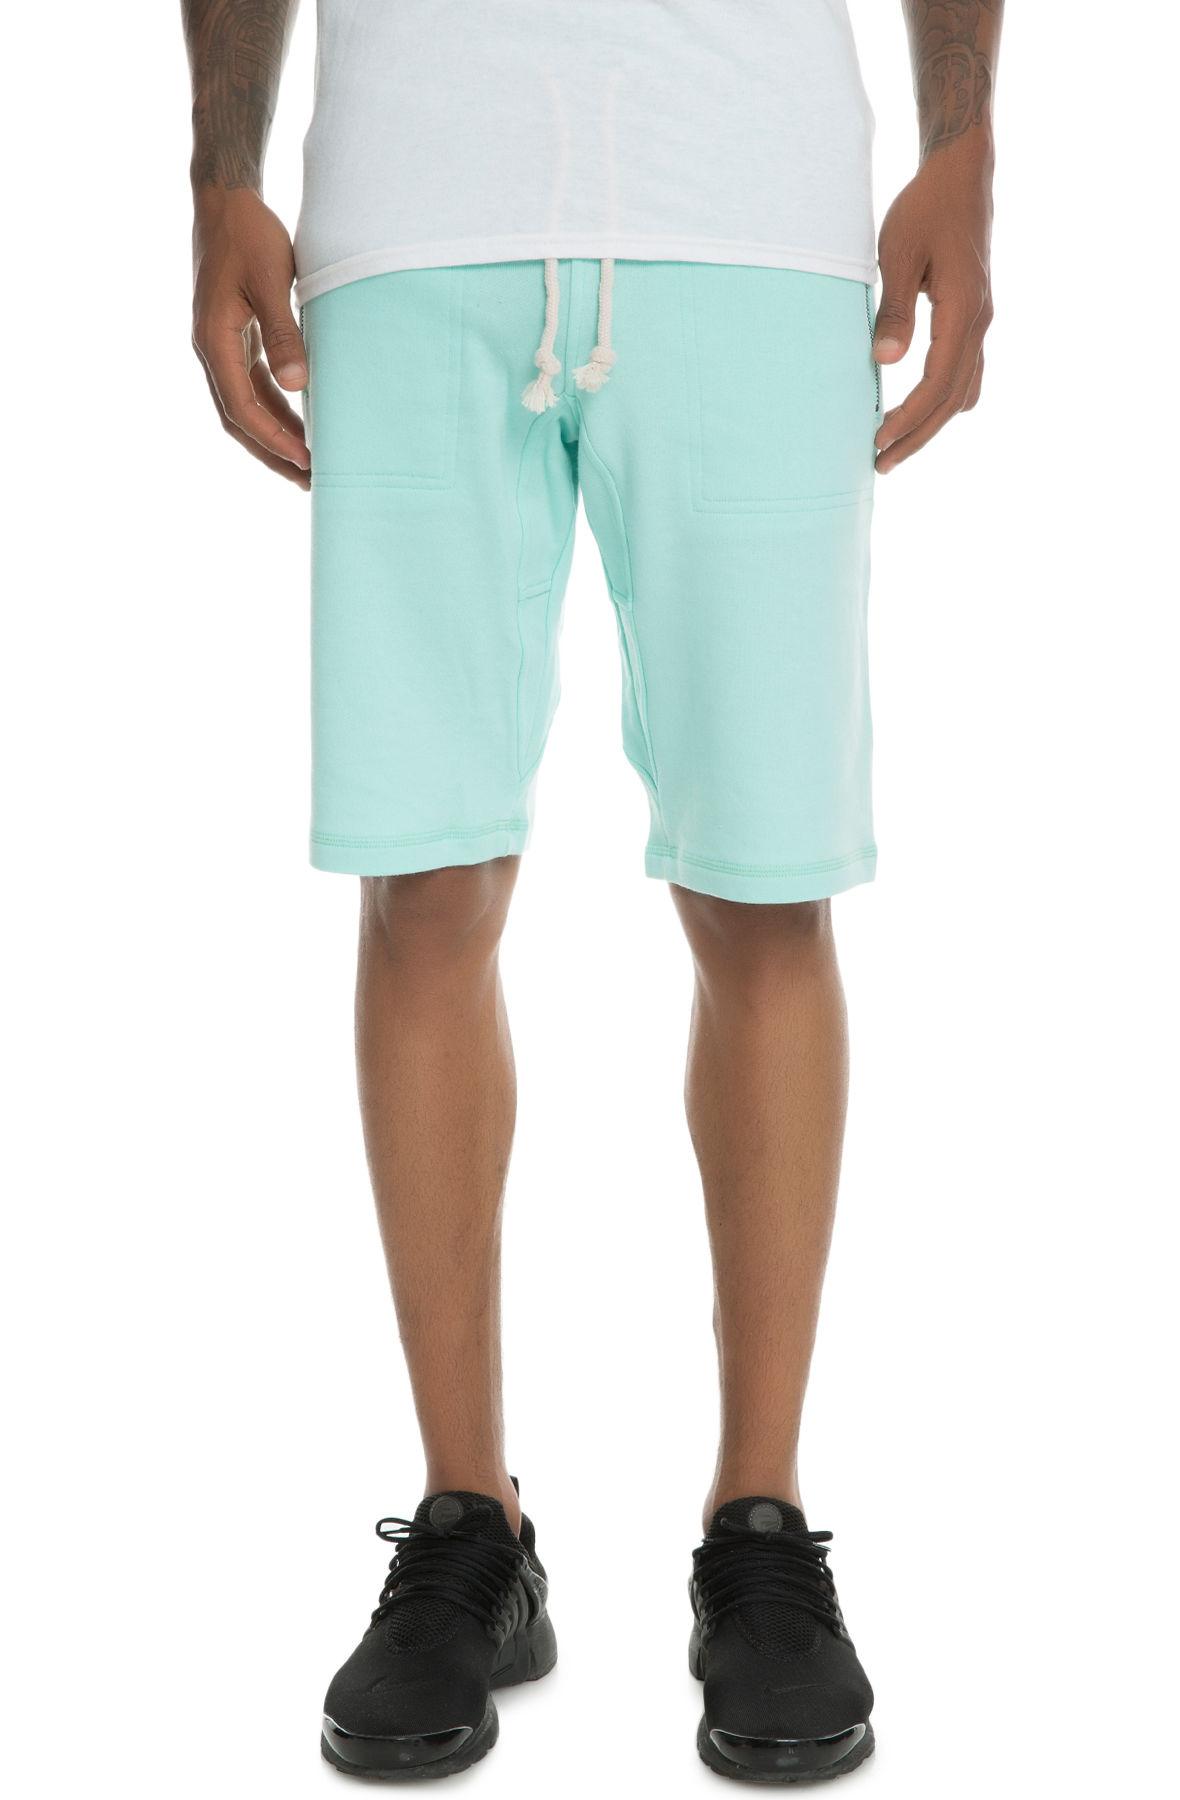 Image of The Laurencio Fleece shorts in Mint